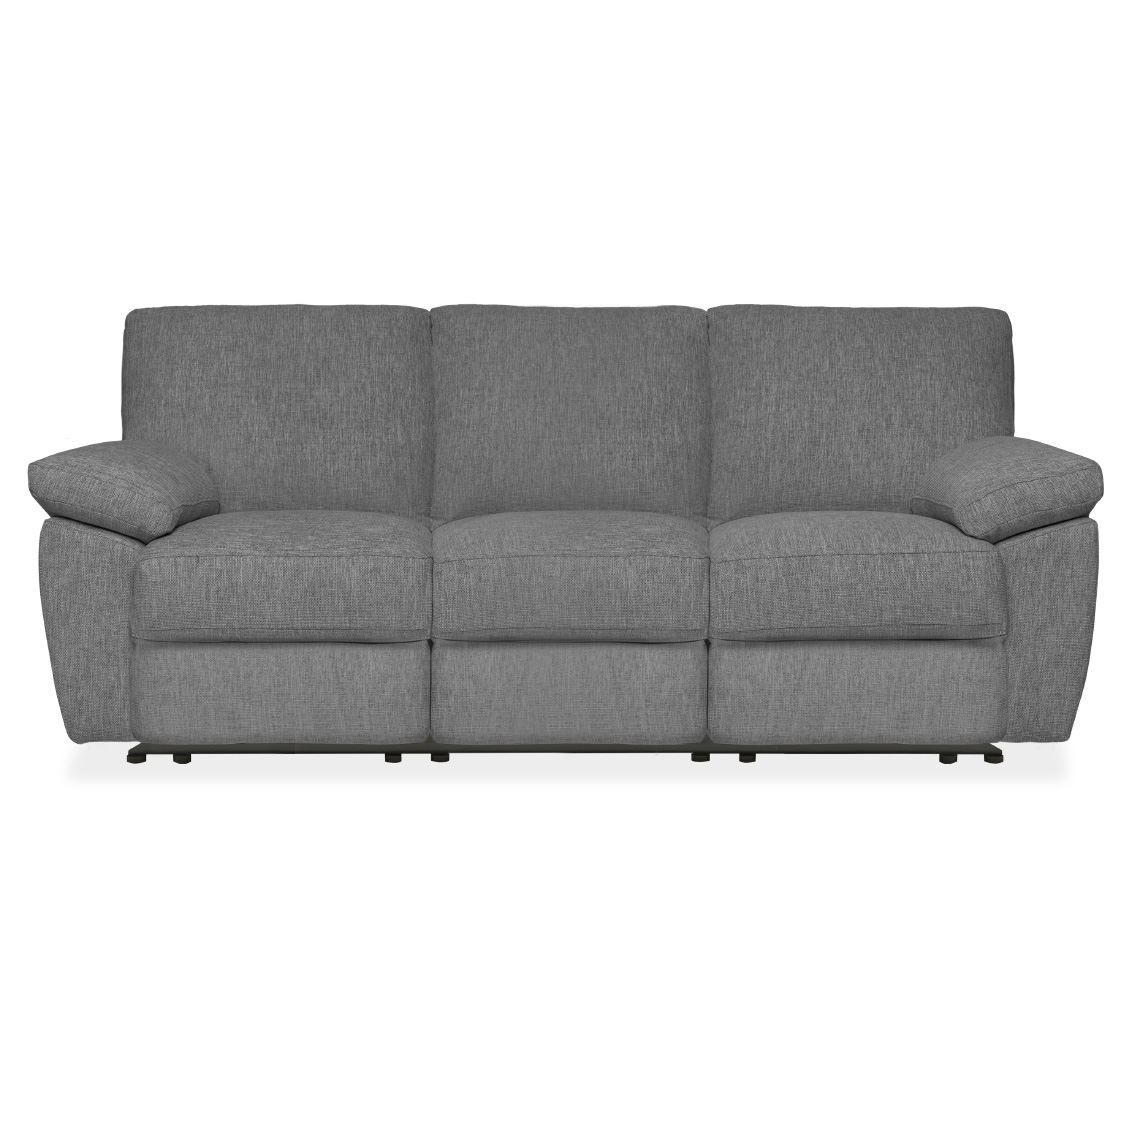 Lucas 3 Seat Fabric Recliner Sofa Grey Reclining Sofa Manual Recliner Sofa Grey Reclining Sofa